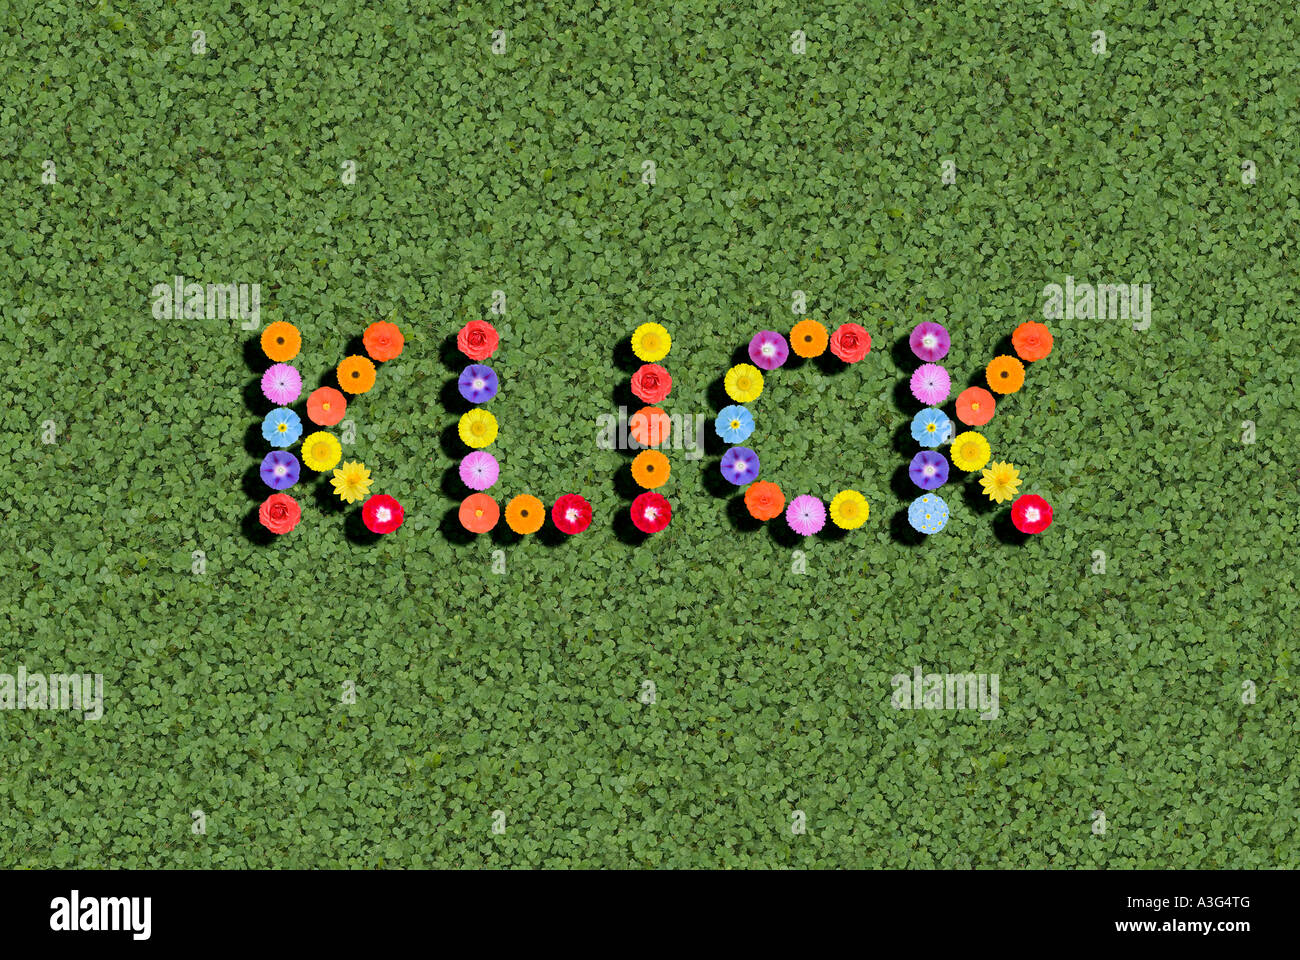 klick stock